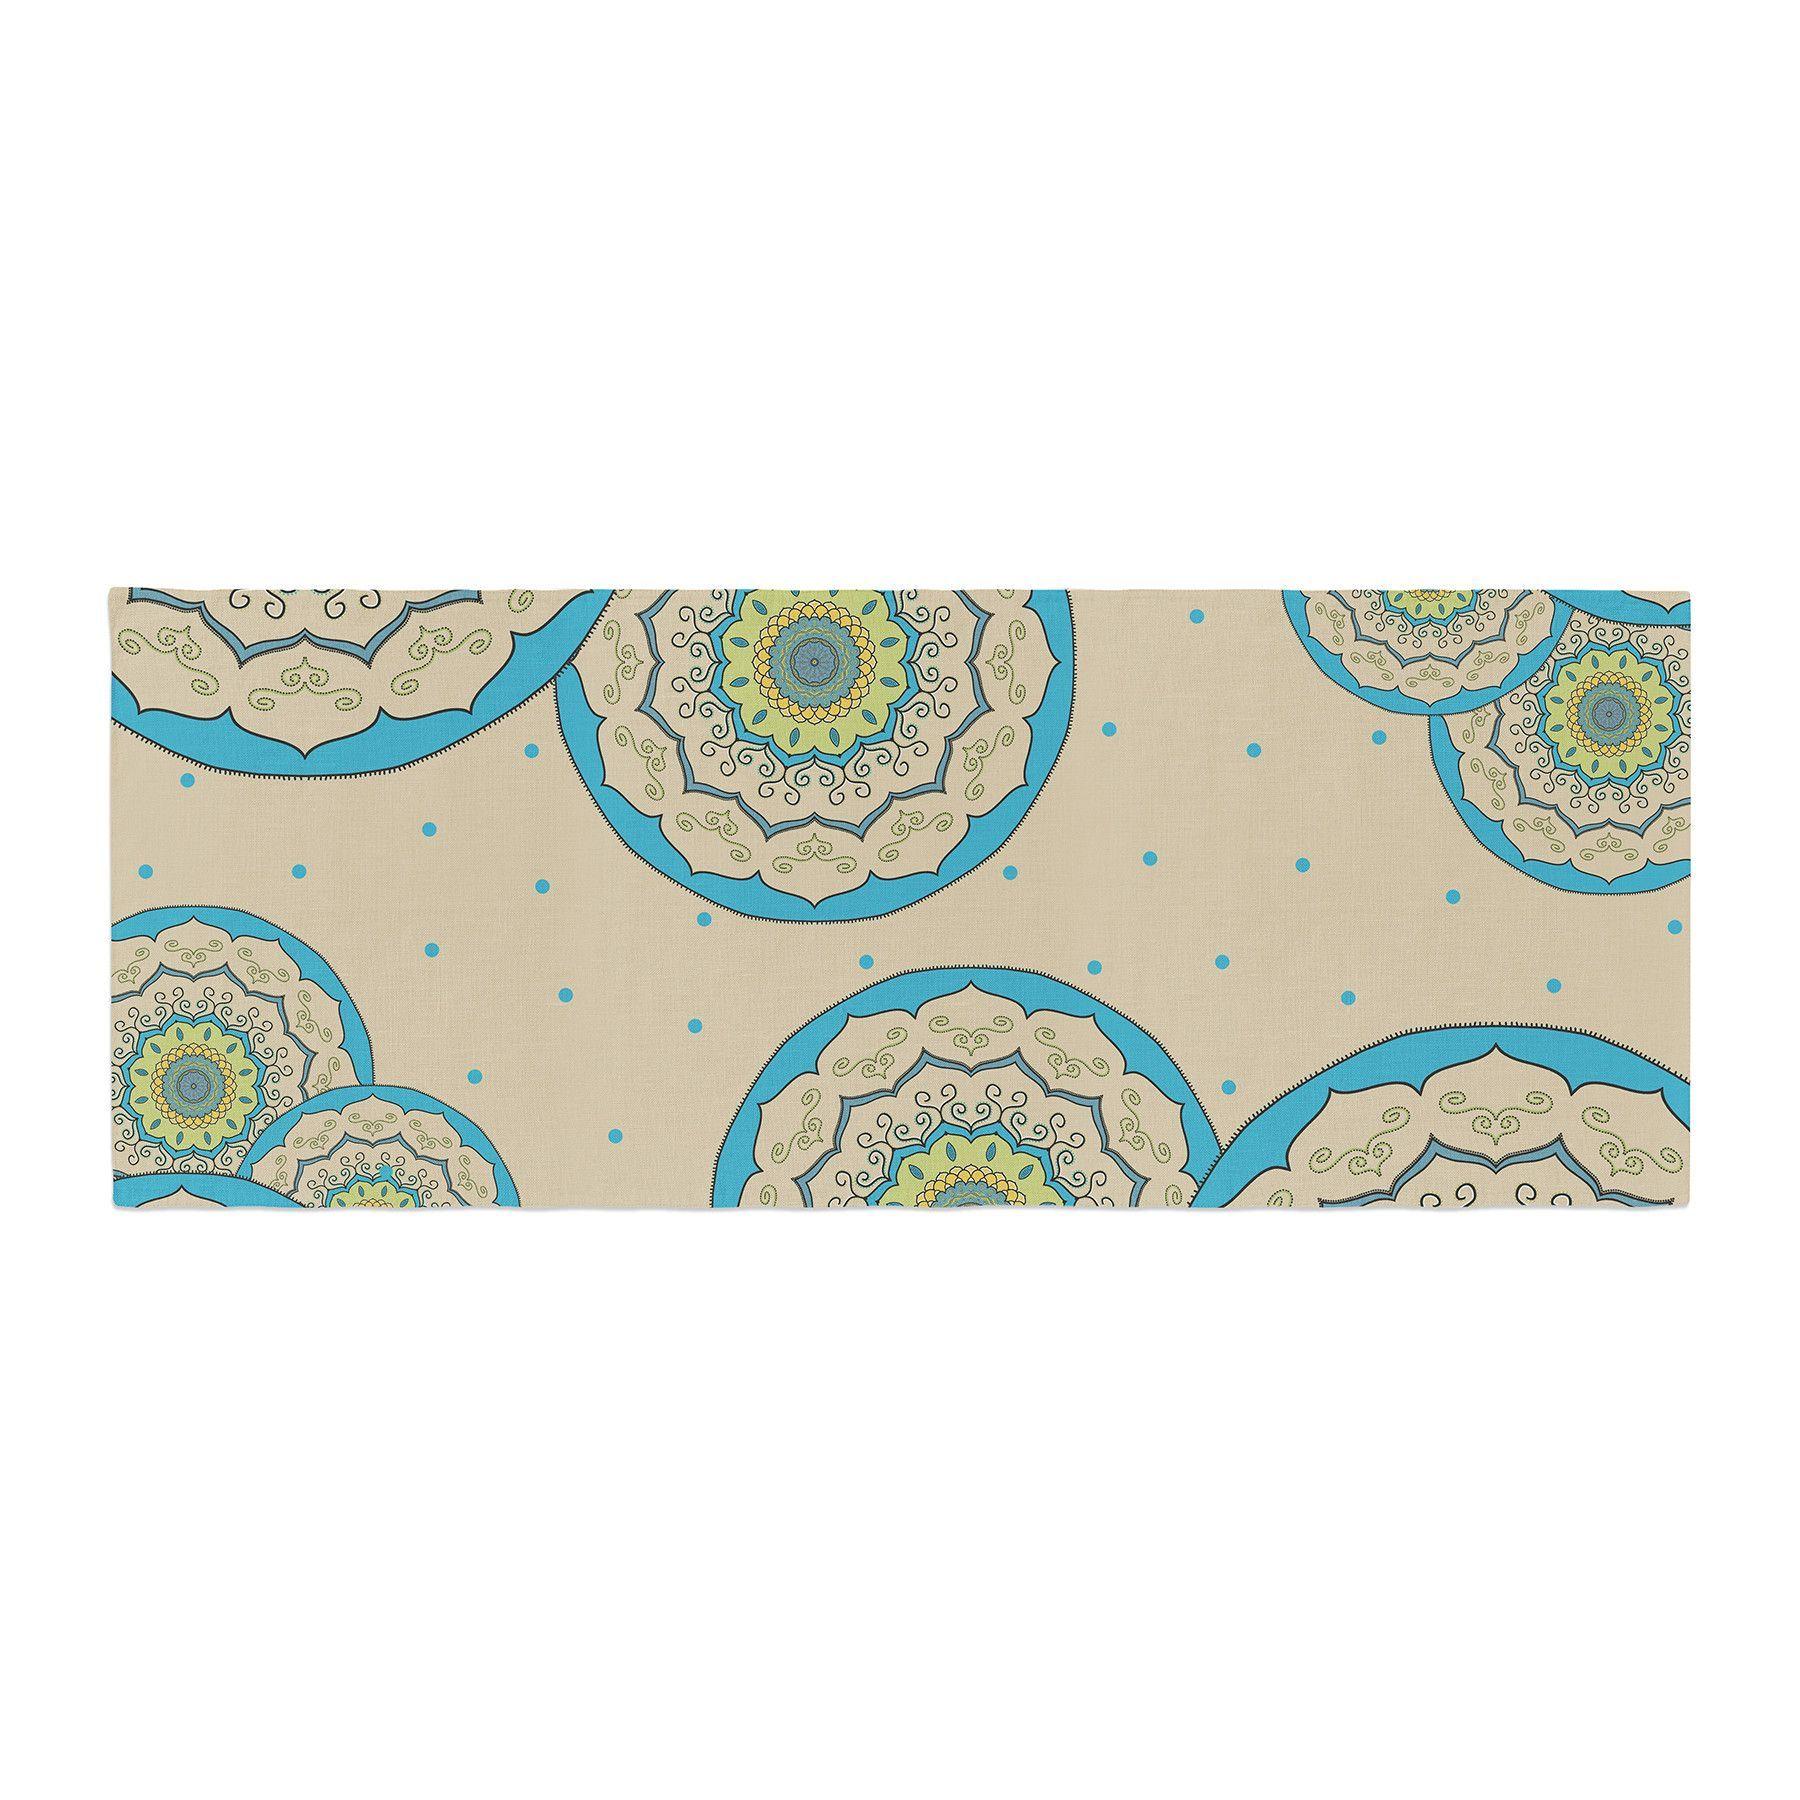 "Cristina Bianco Design ""Blue Green Mandala Design"" Blue Green Illustration Bed Runner"